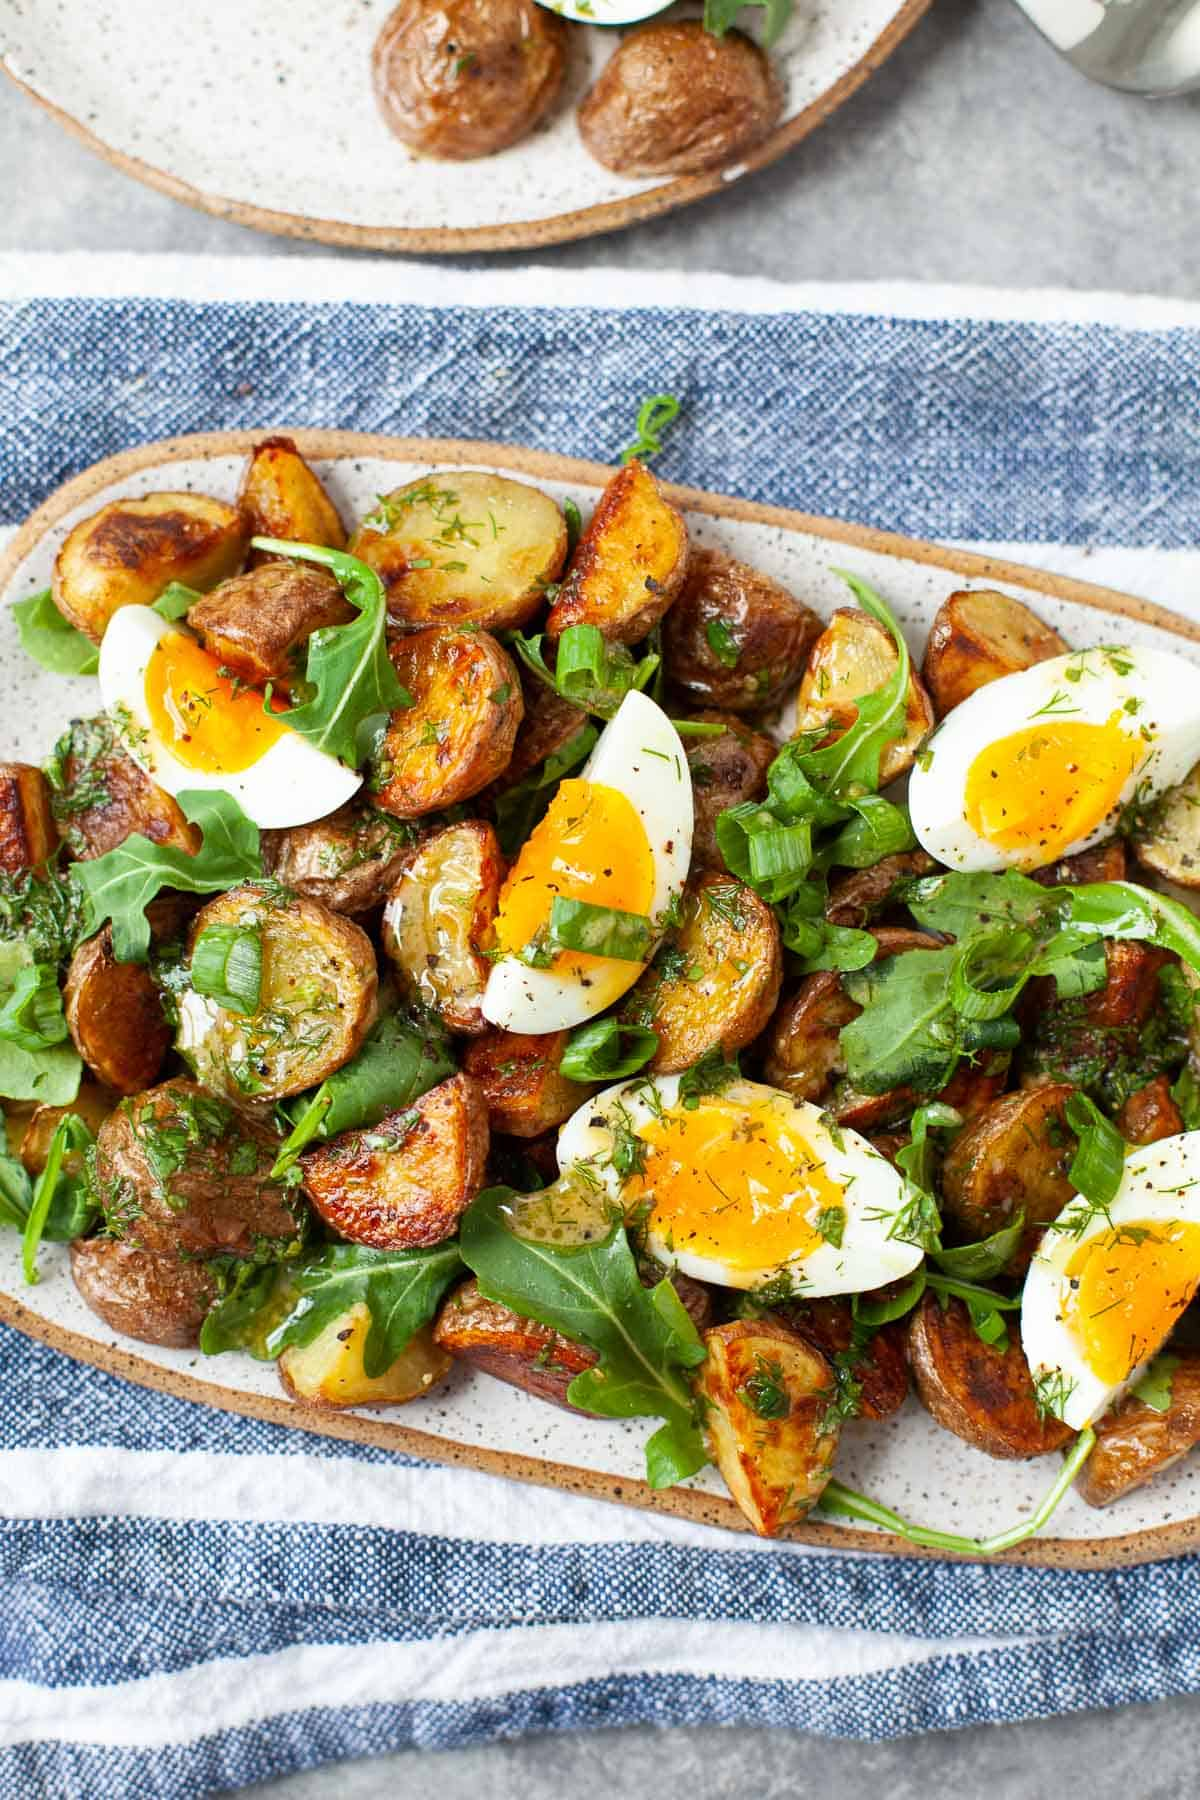 roasted potato salad with soft boiled eggs, arugula, and scallions